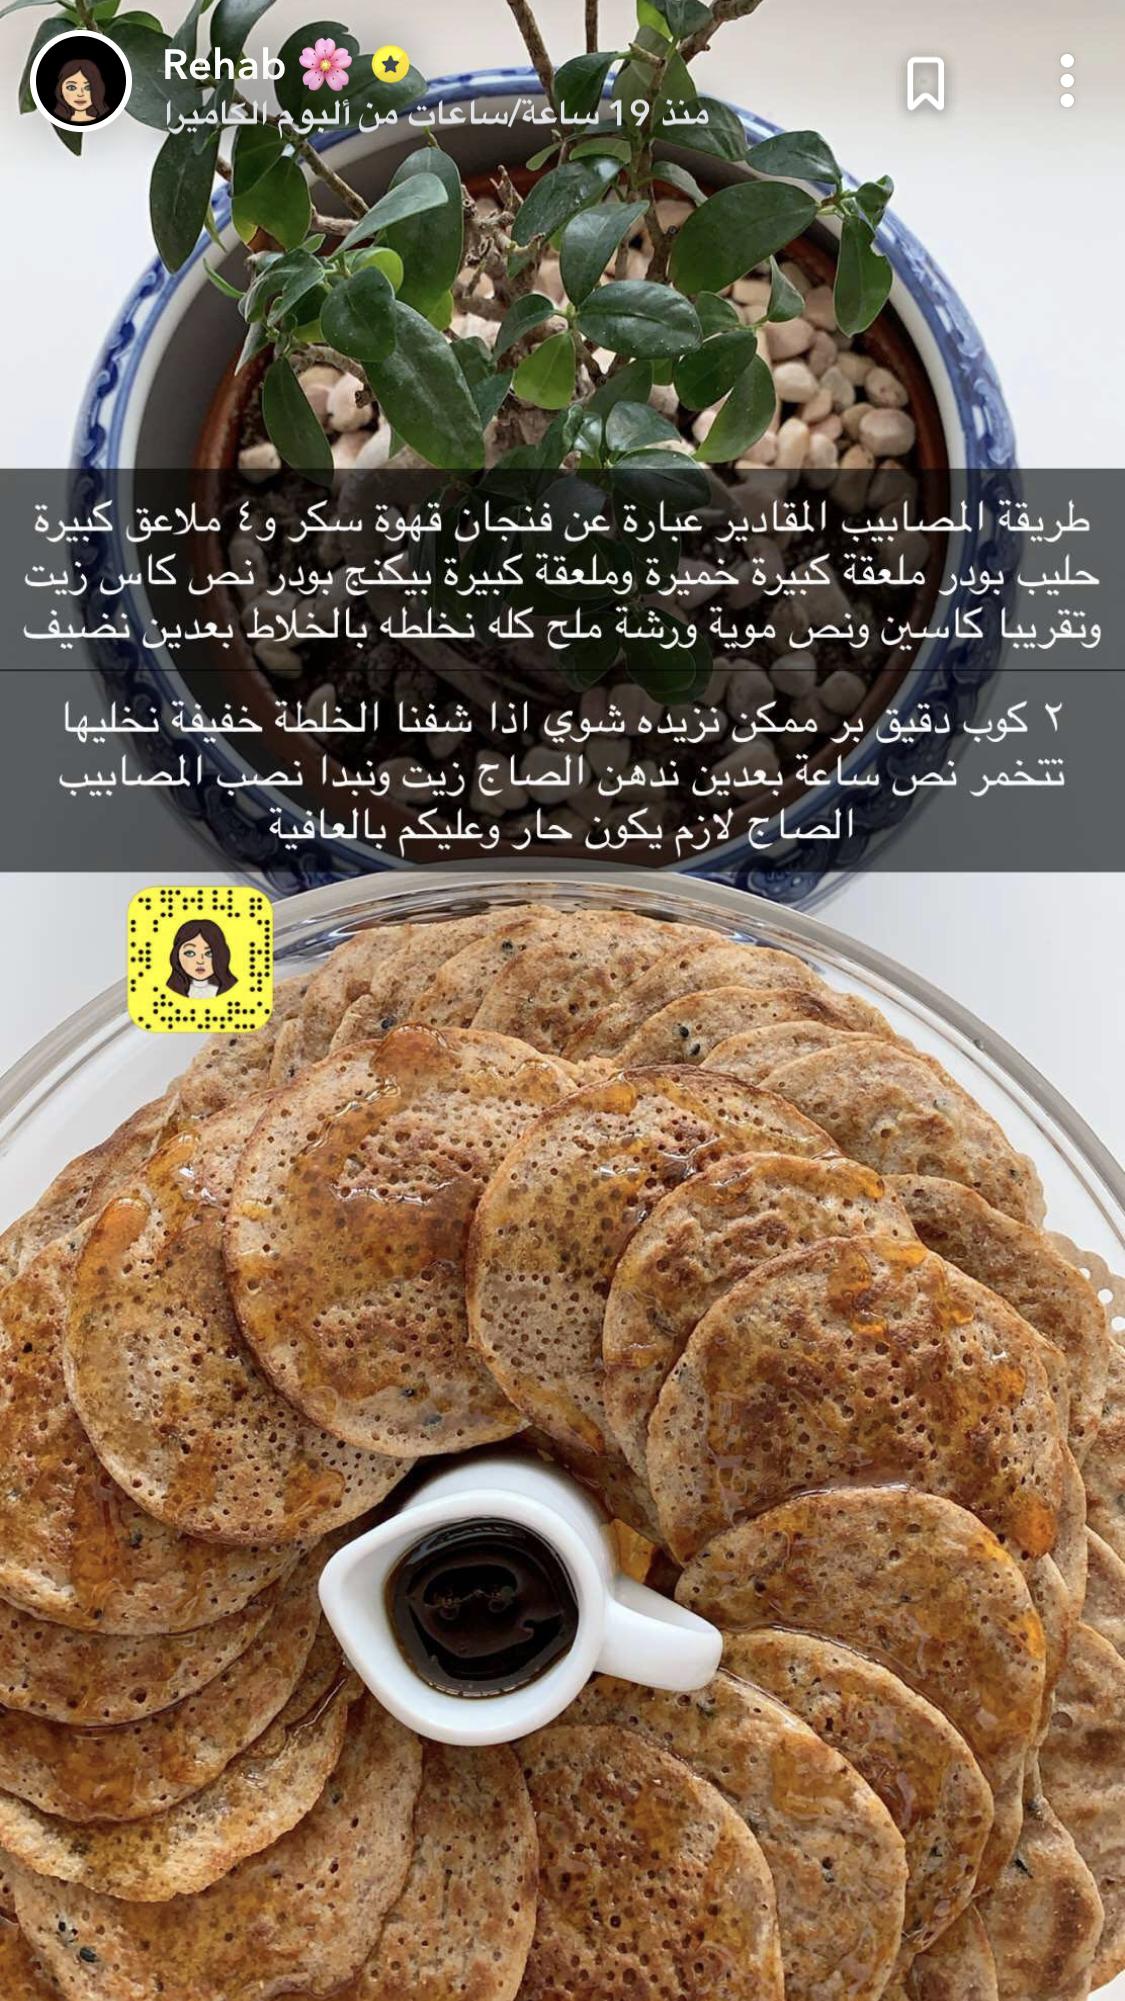 Pin By Alanoudmummed On حالي ومالح Cookout Food Helthy Food Save Food